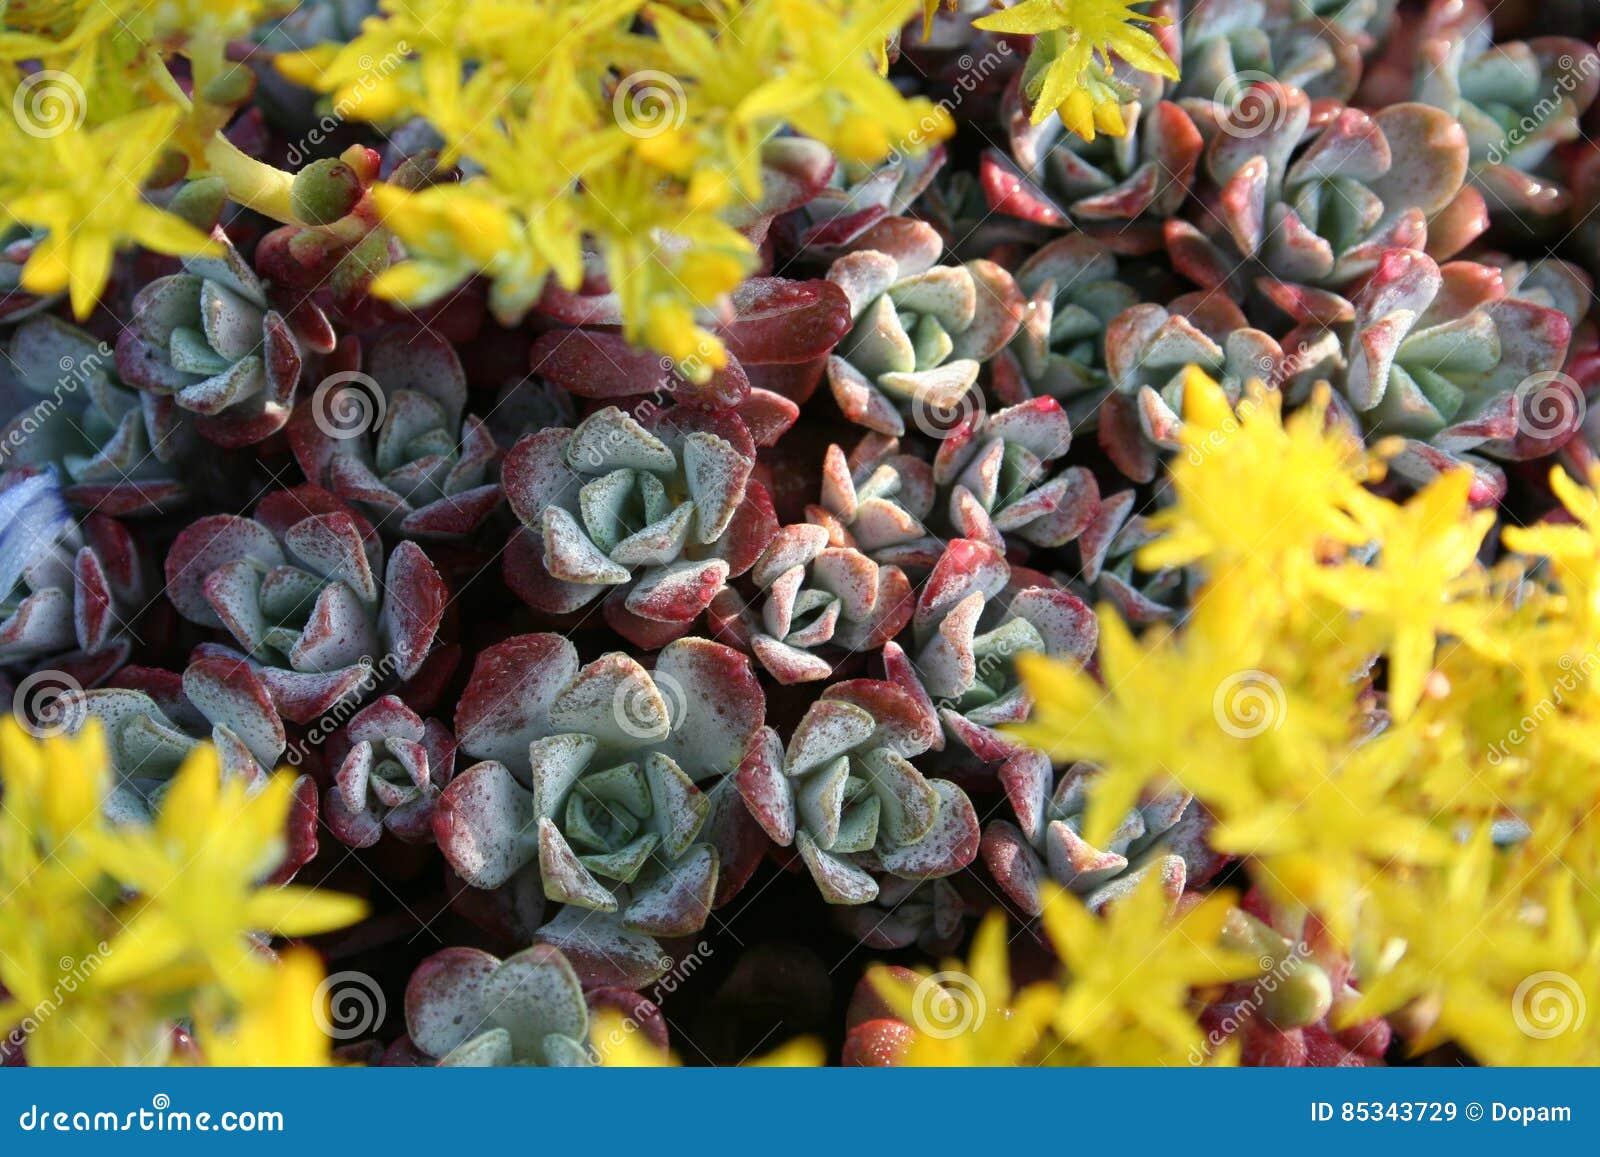 Stonecrop sedum with yellow flowers stock image image of selective download comp mightylinksfo